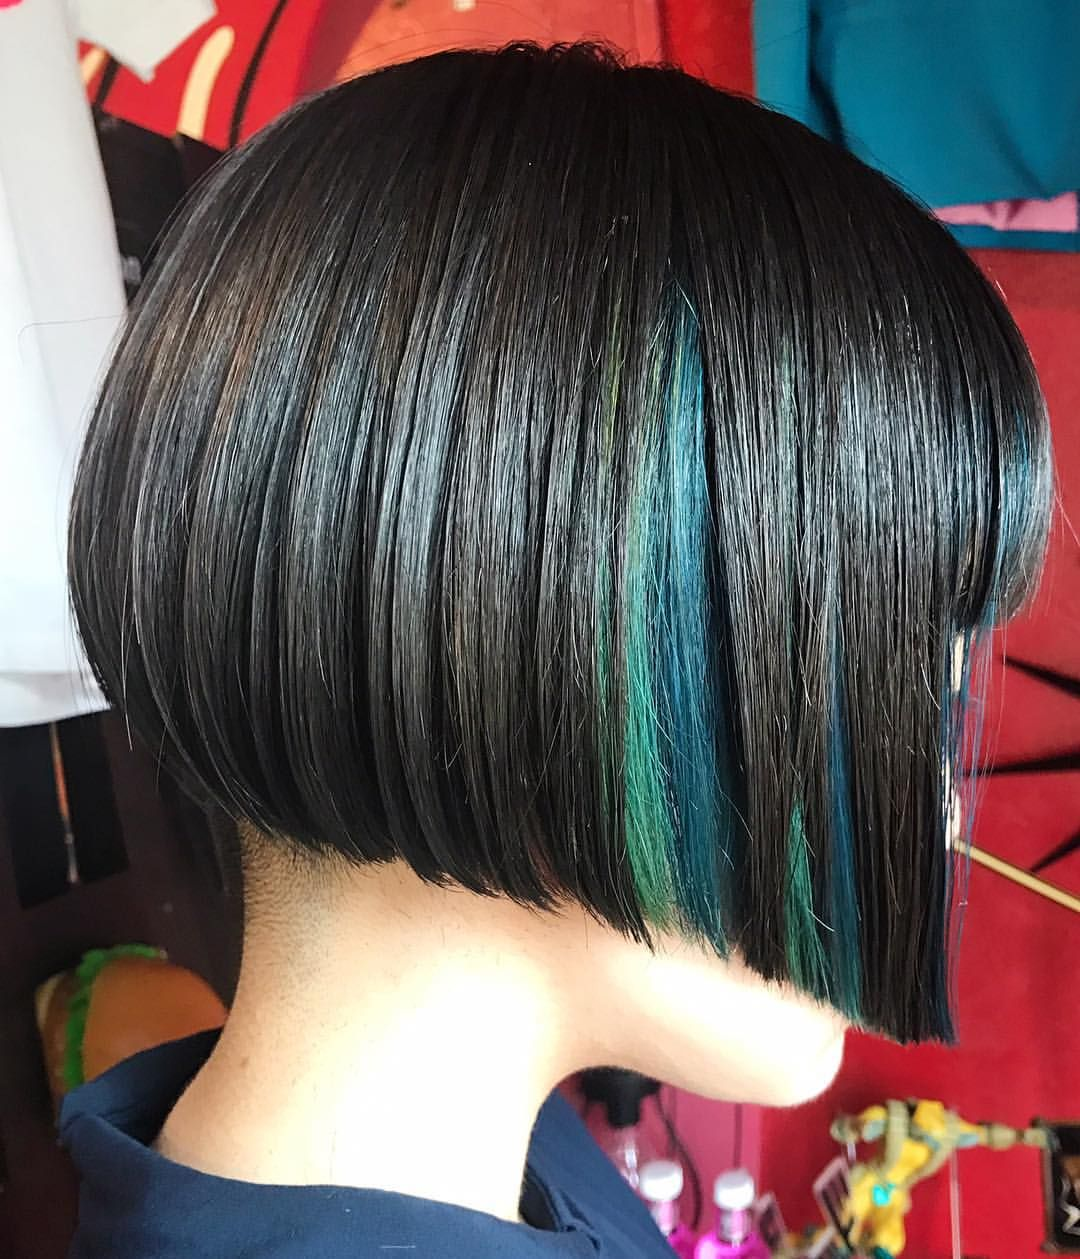 Hairdare Womenshaircuts Bobhaircut ショートボブ 前髪 ボブパーマ ボブ